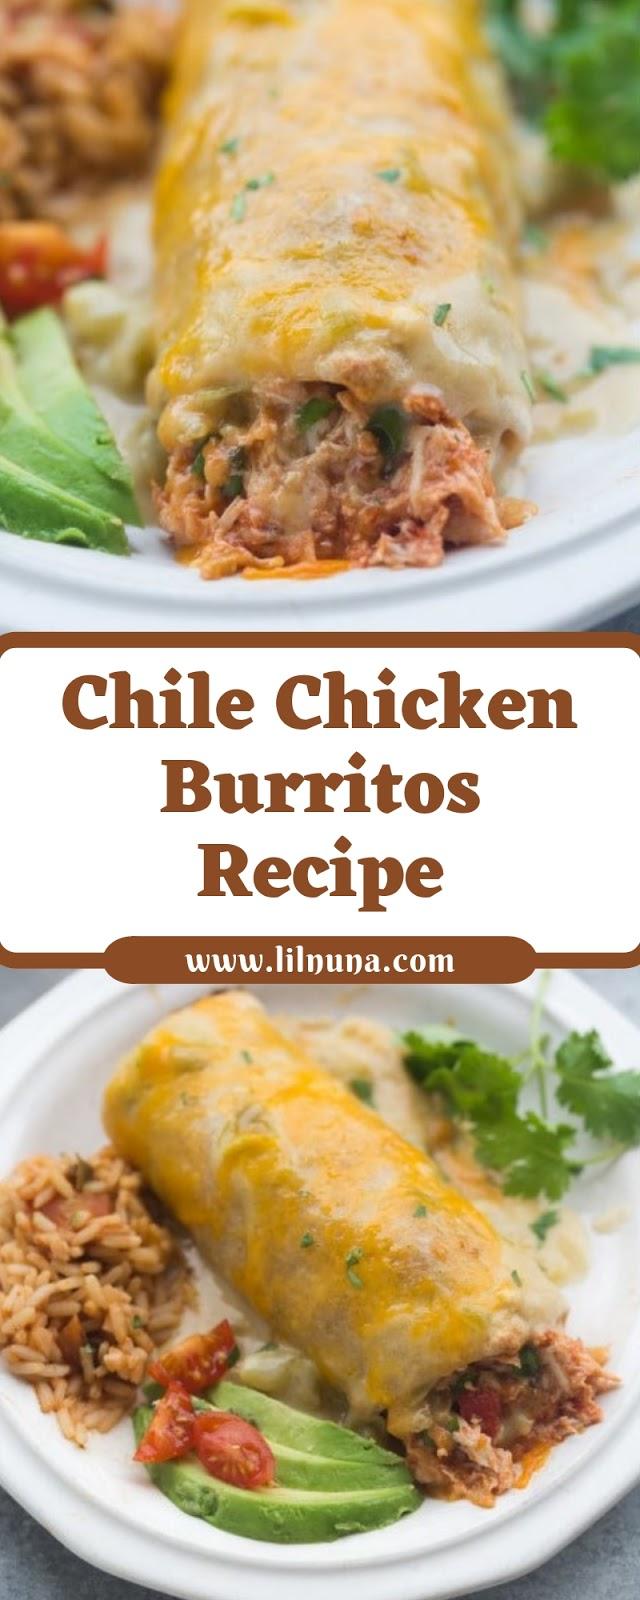 Chile Chicken Burritos Recipe